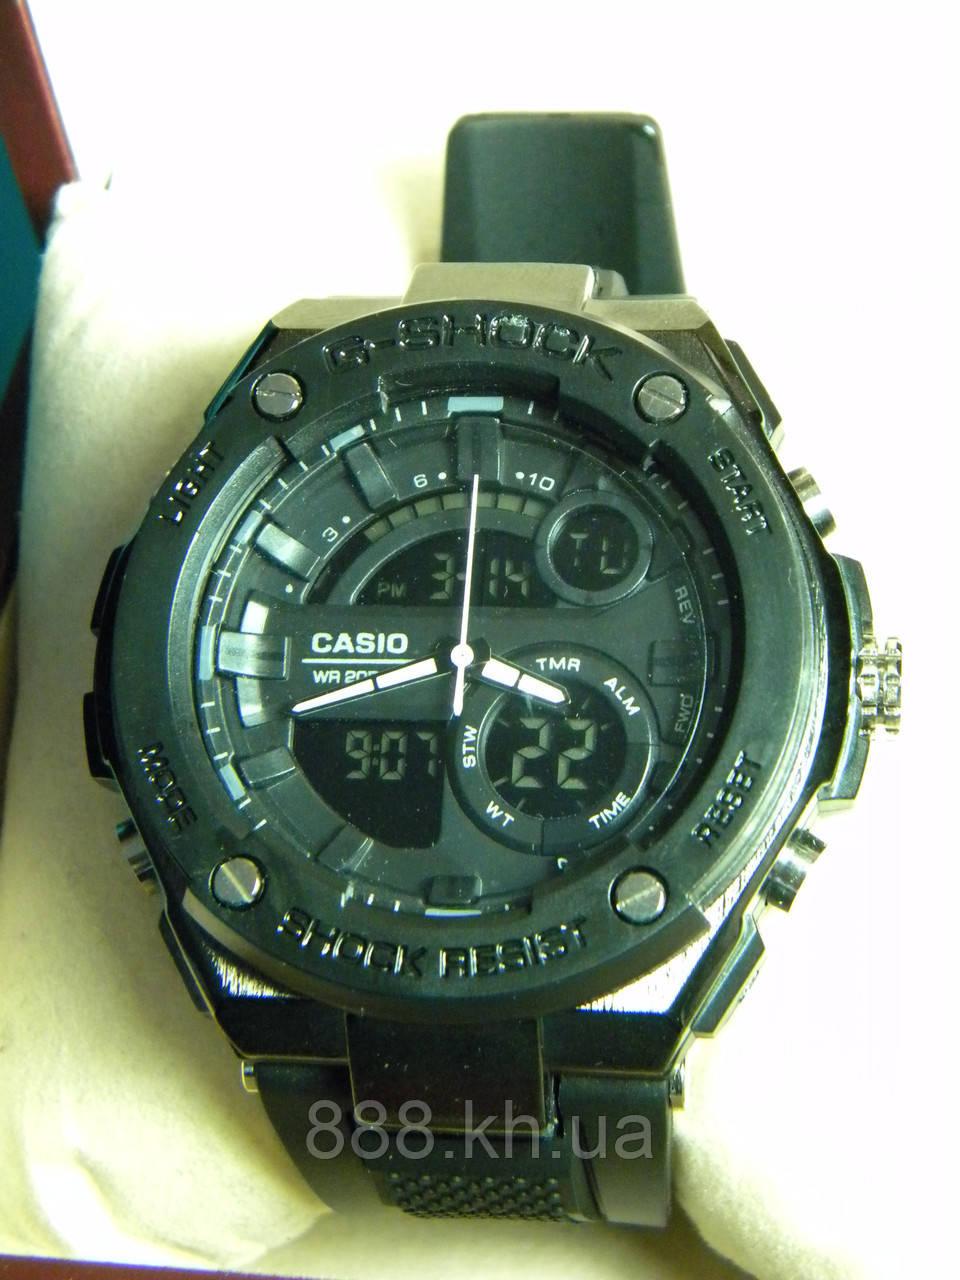 Часы мужские CASIO G-Shock метал. корпус реплика